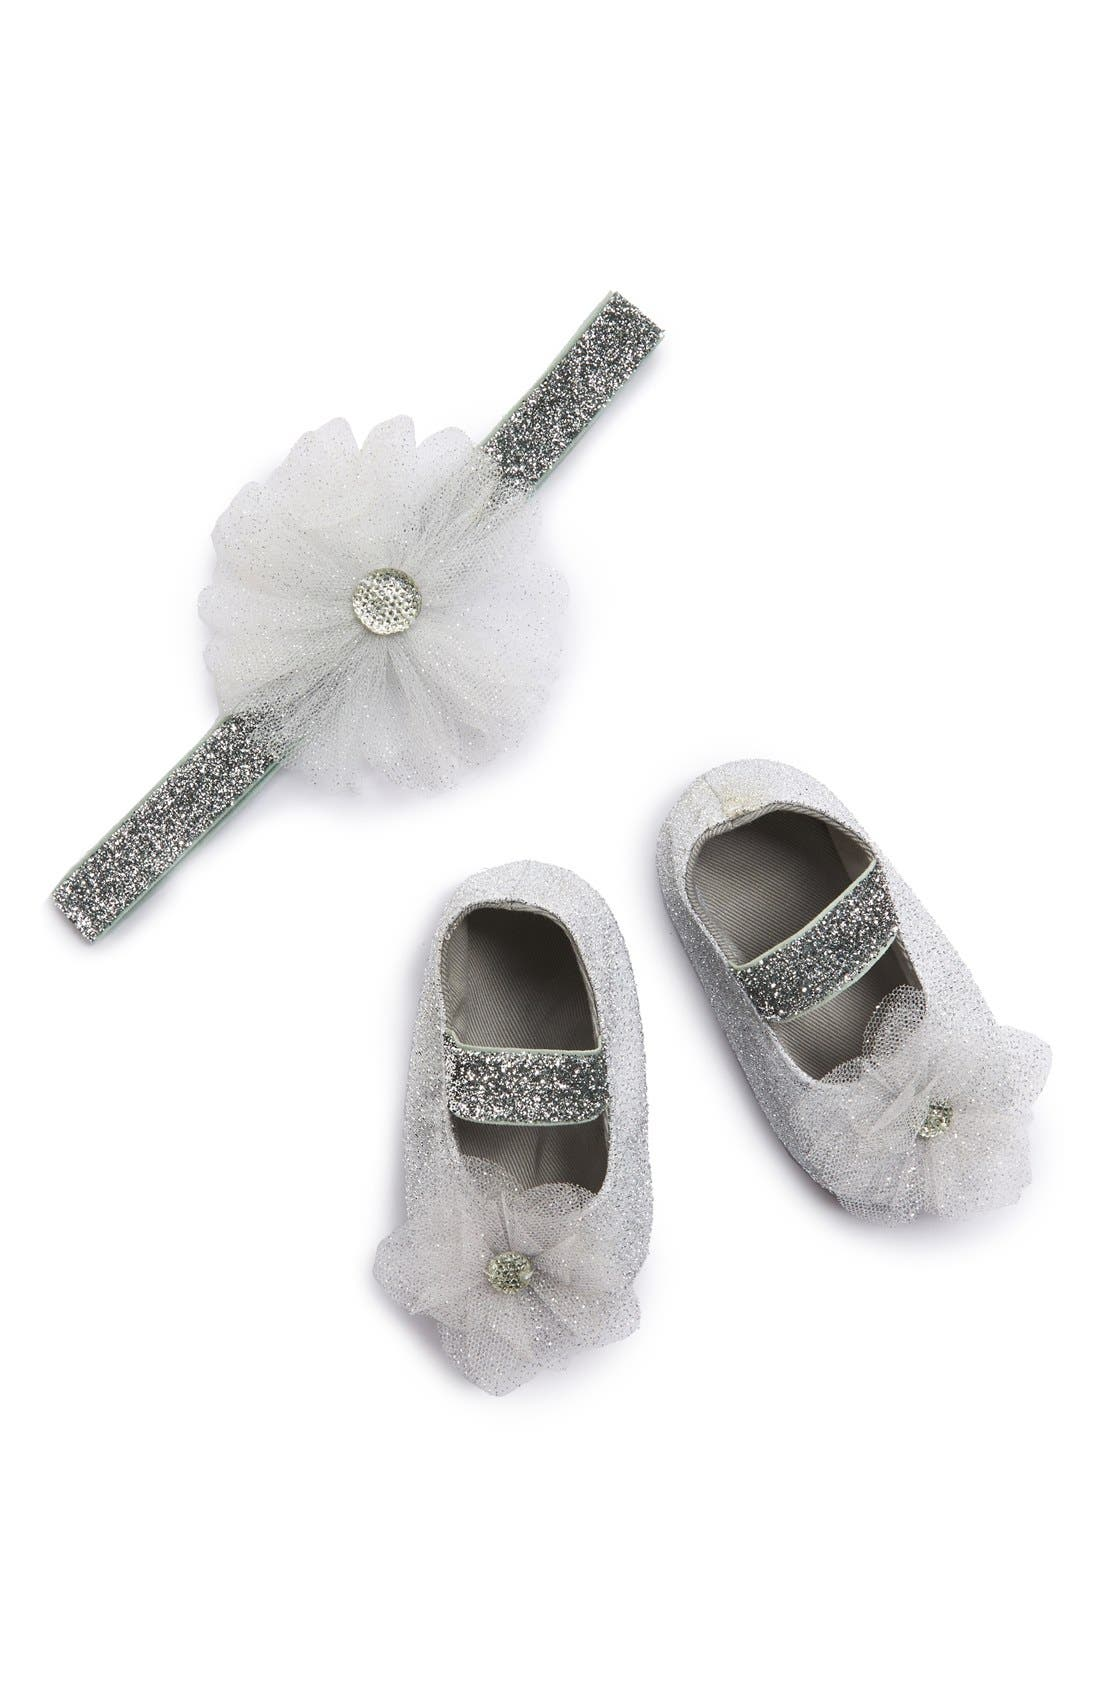 Alternate Image 1 Selected - PLH Bows & Laces 'Tutu Flower' Glitter Headband & Crib Shoes (Baby Girls)